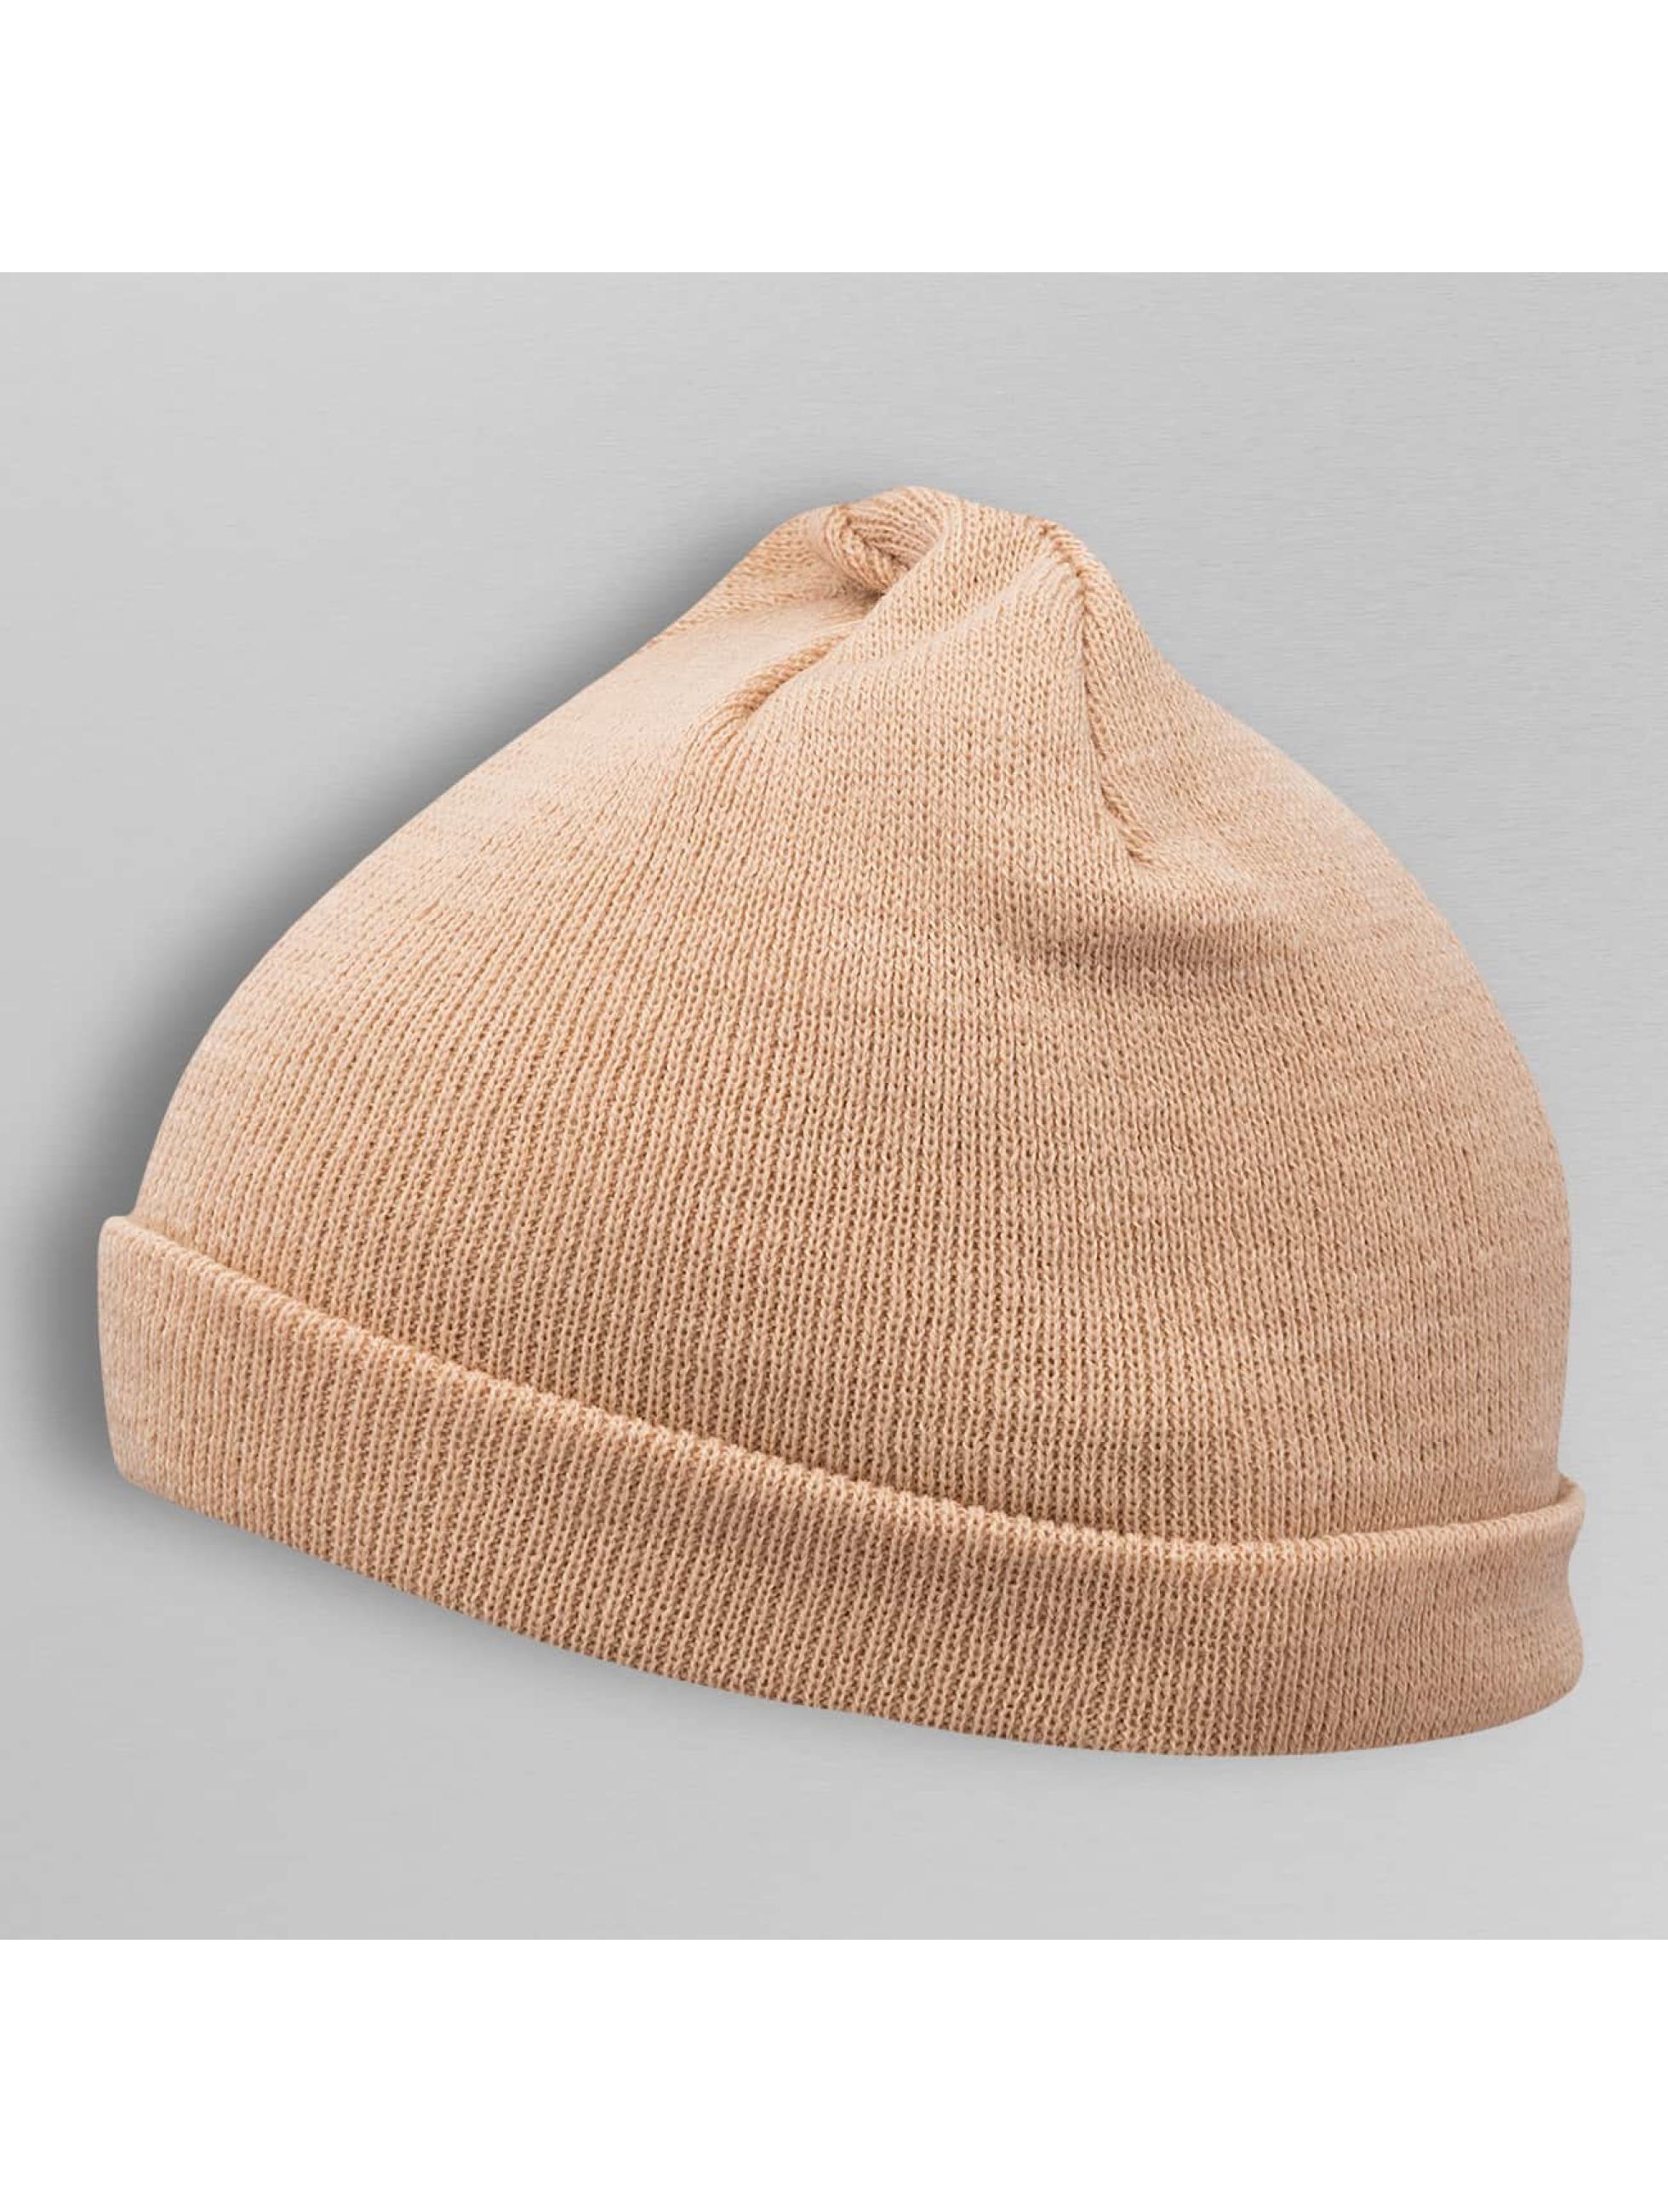 MSTRDS Bonnet Short Pastel Cuff Knit beige